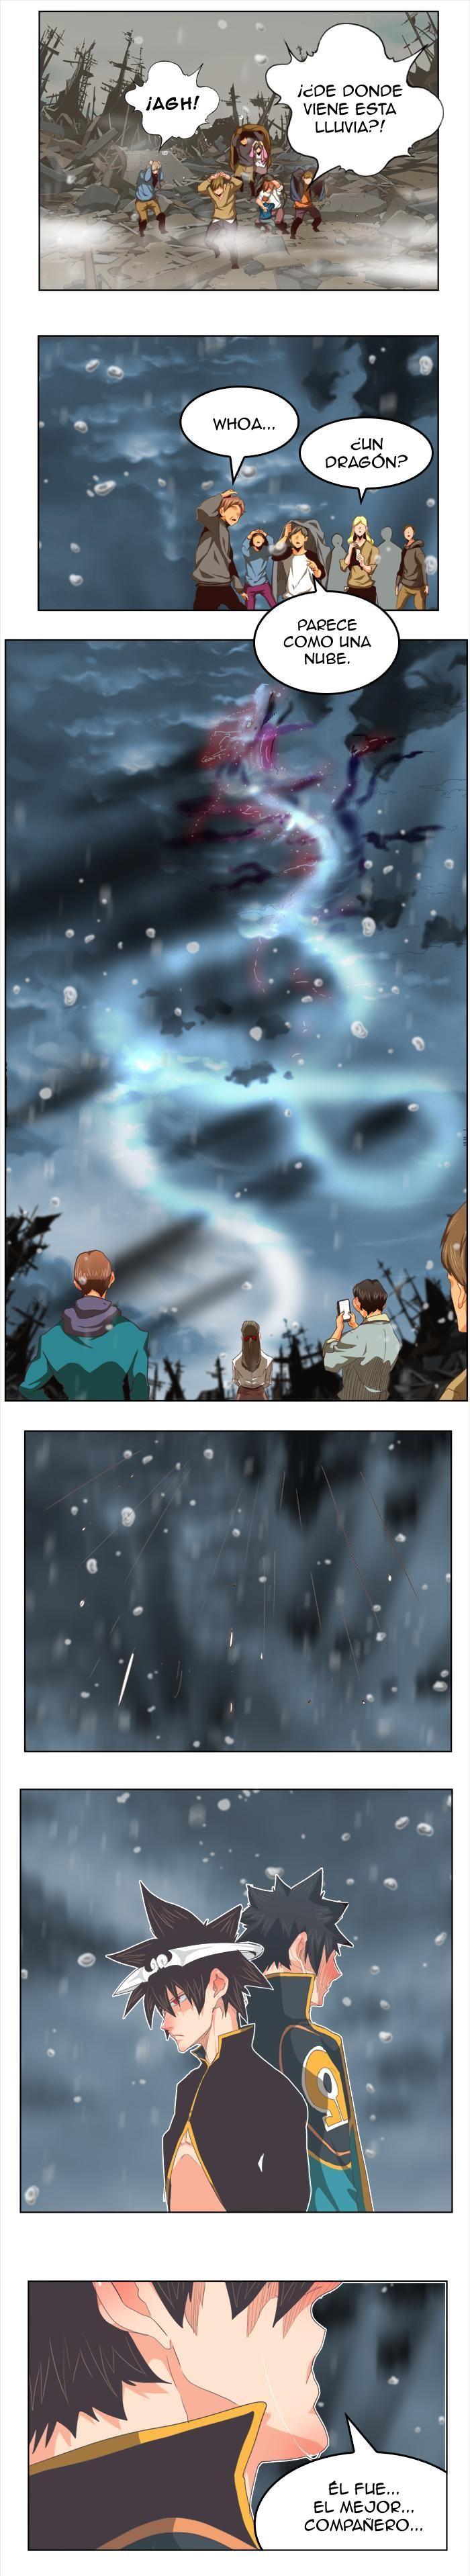 http://c5.ninemanga.com/es_manga/pic2/37/485/524777/8ddc2bfdb3ada3f99bfb02ec06d1be4d.jpg Page 4